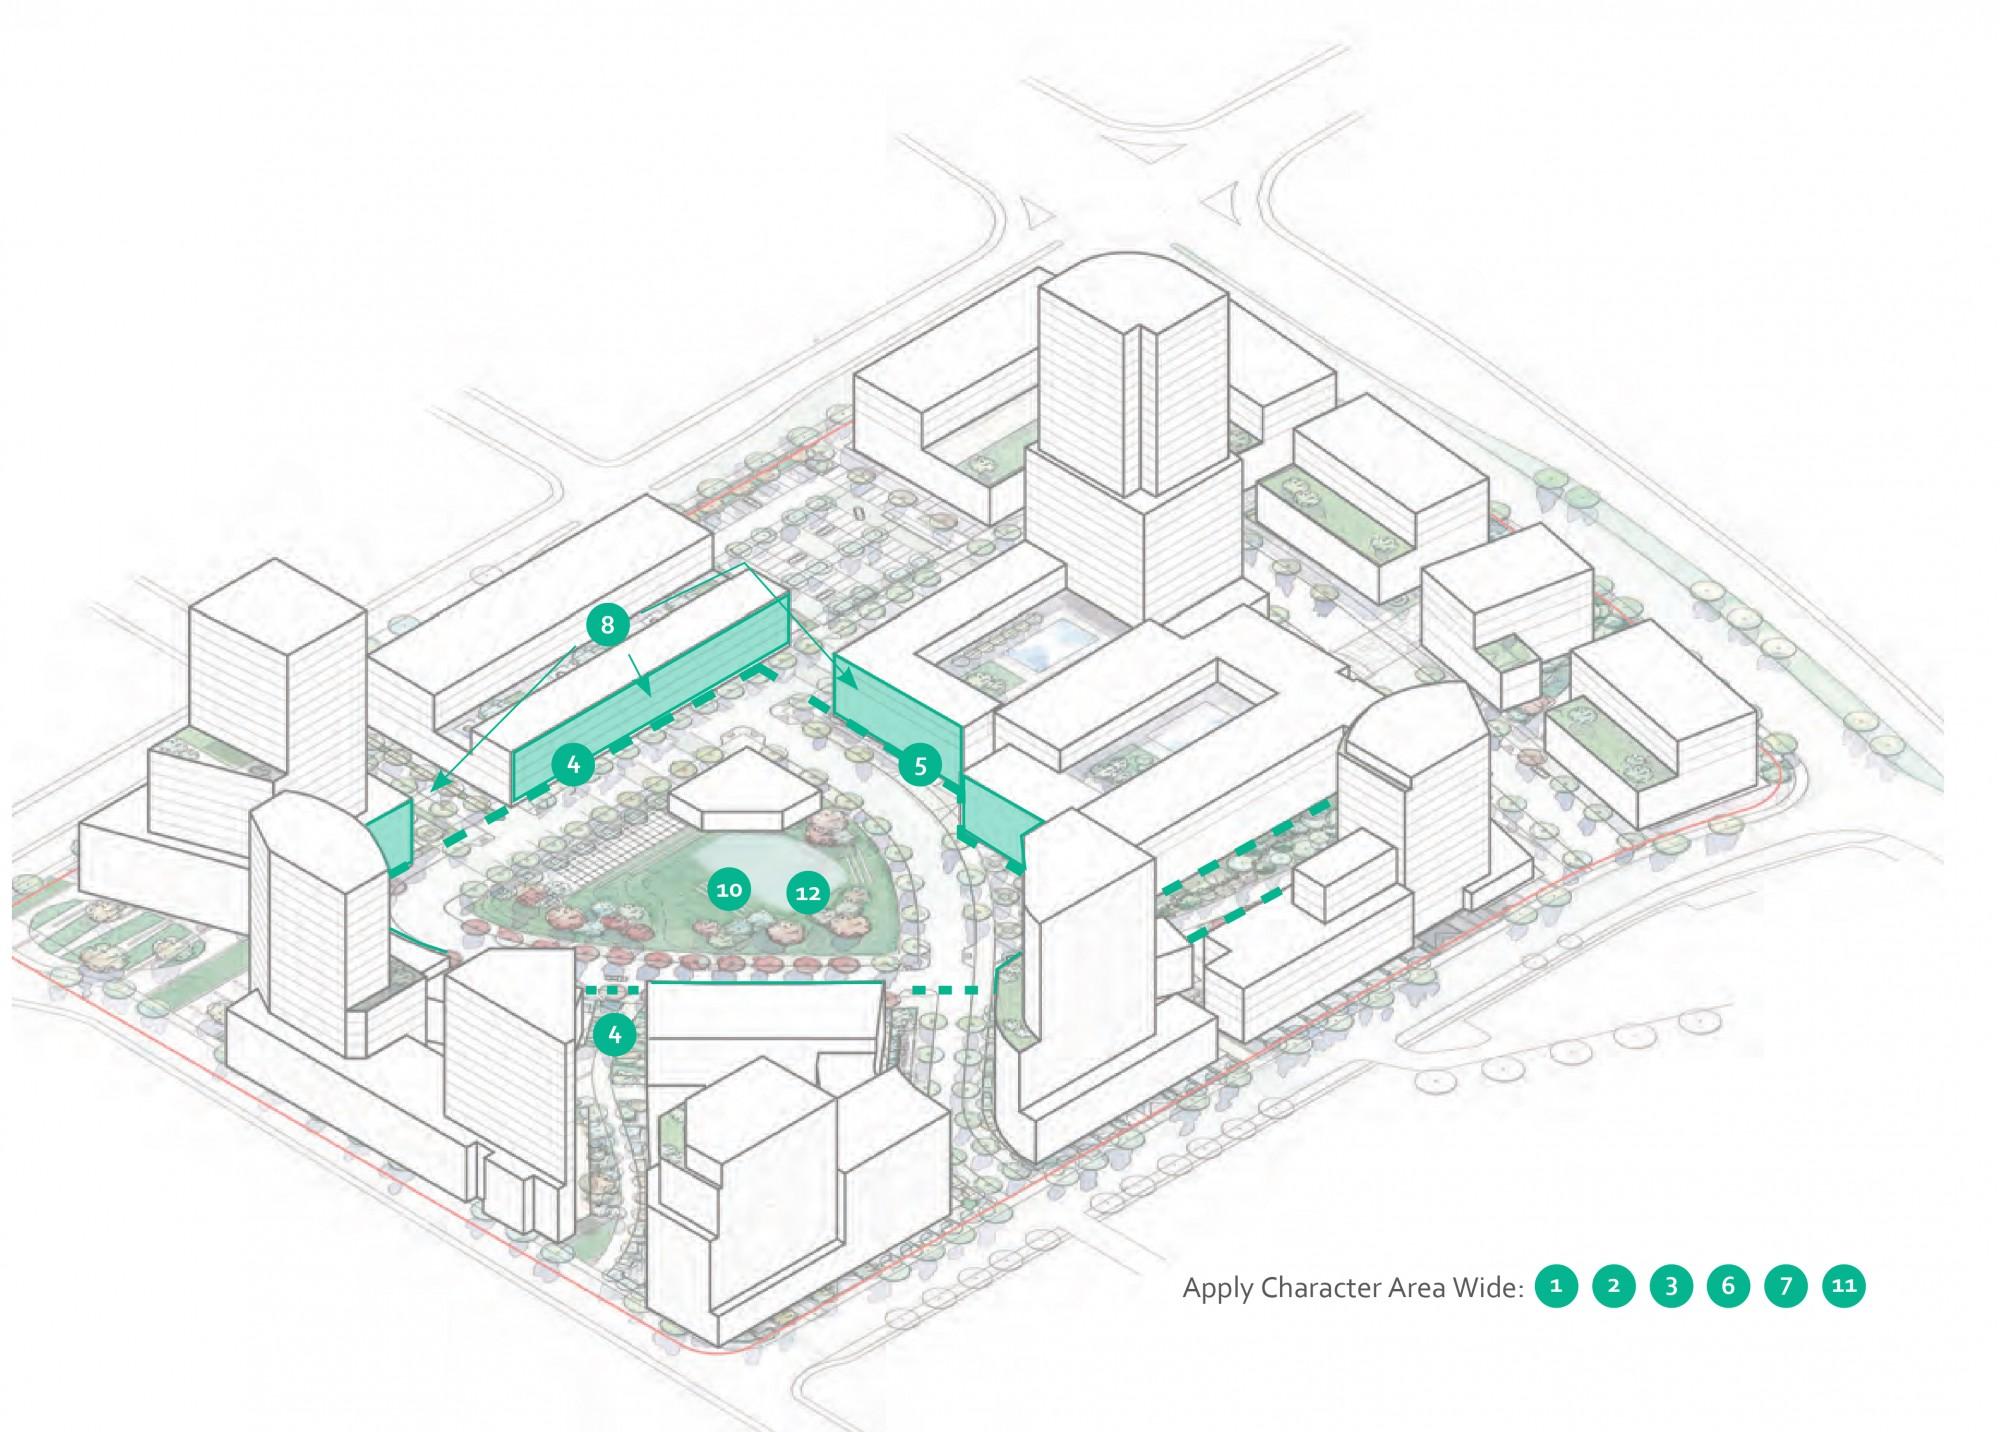 2040 OCP - Comprehensive Zone 26 - diagram of Capri Central Park